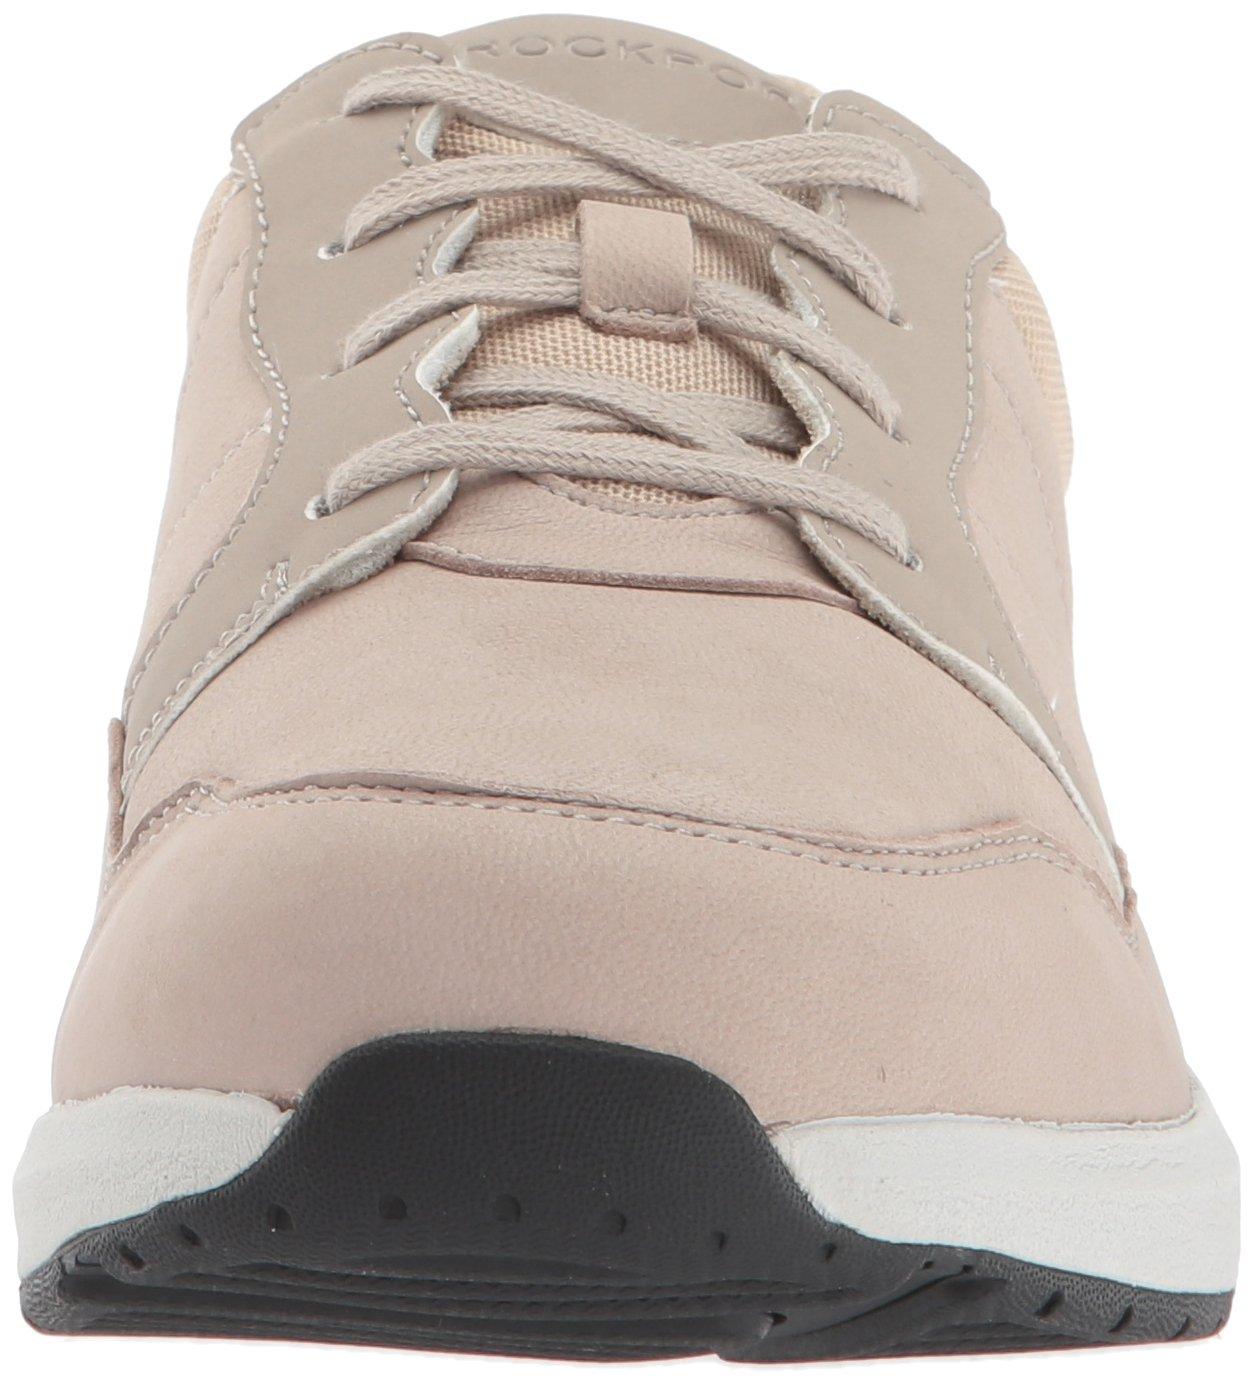 Rockport Women's Trustride W 10 Tie Fashion Sneaker B01N26YYM0 10 W W US|Taupe 0b7264